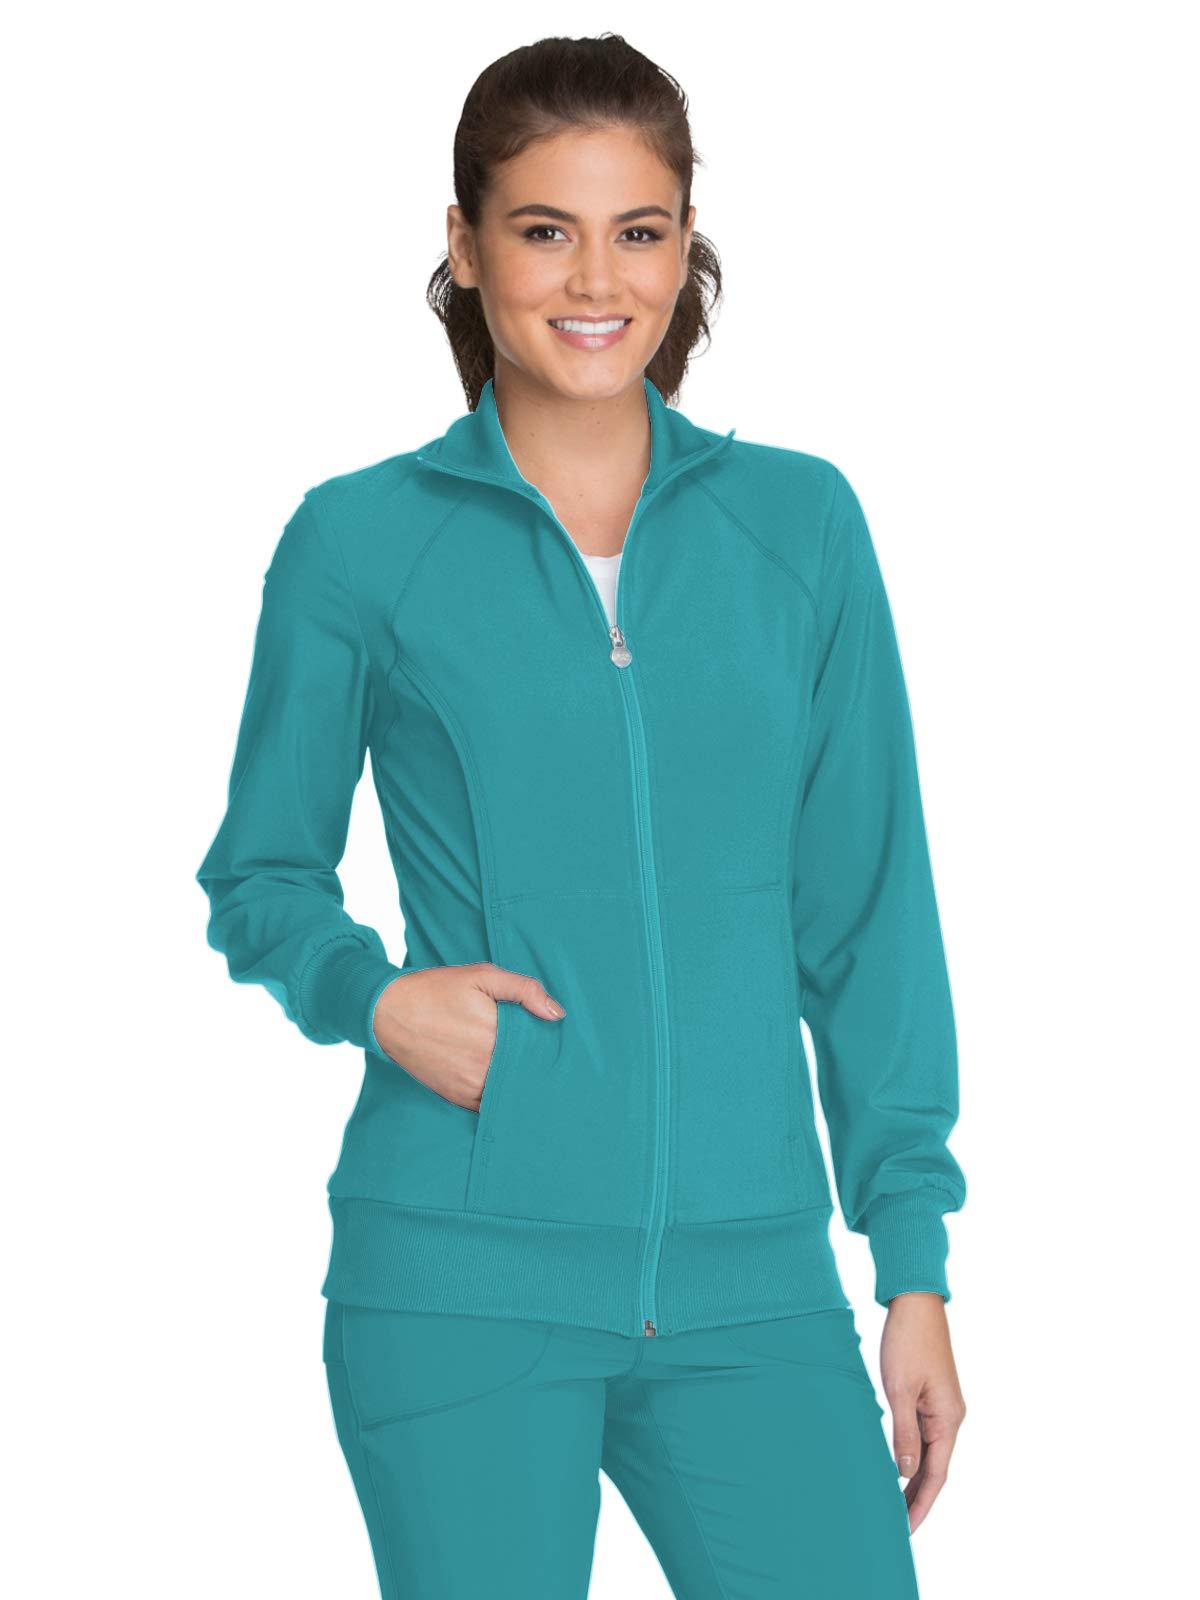 Cherokee Women's Infinity Zip Front Warm-up Jacket, Teal Blue, XX-Large by Cherokee